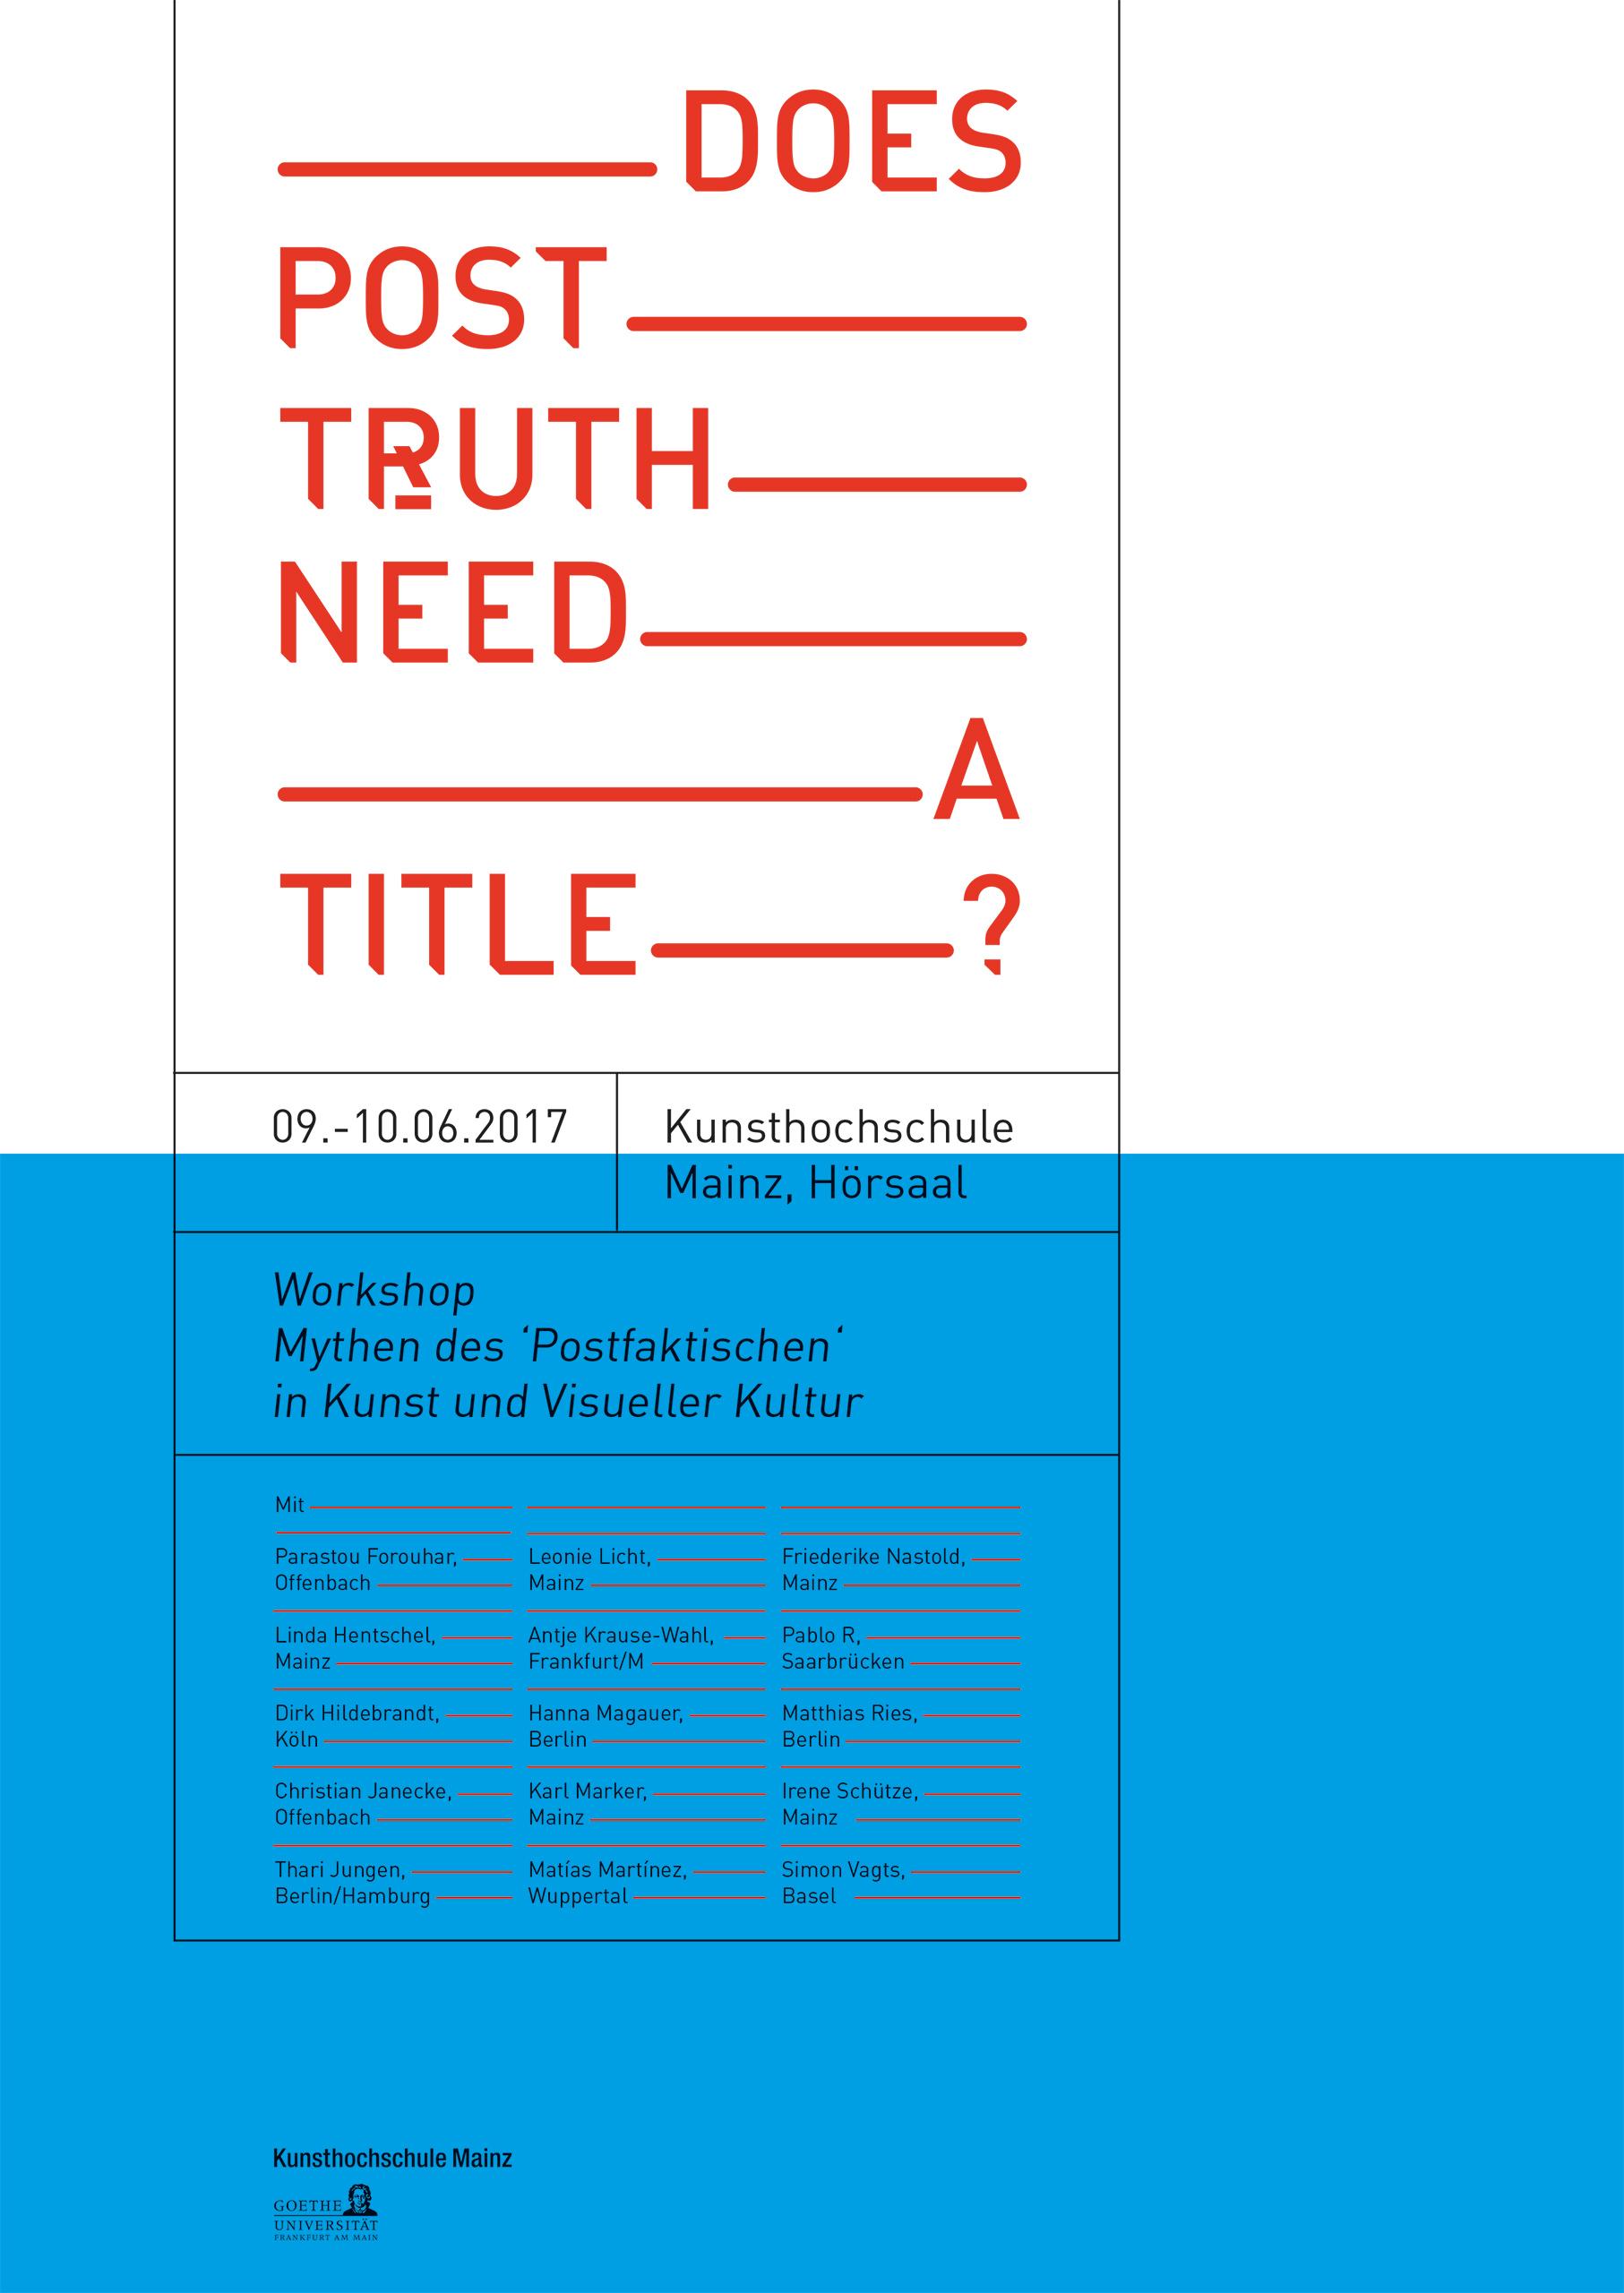 Copyright: Kunsthochschule Mainz